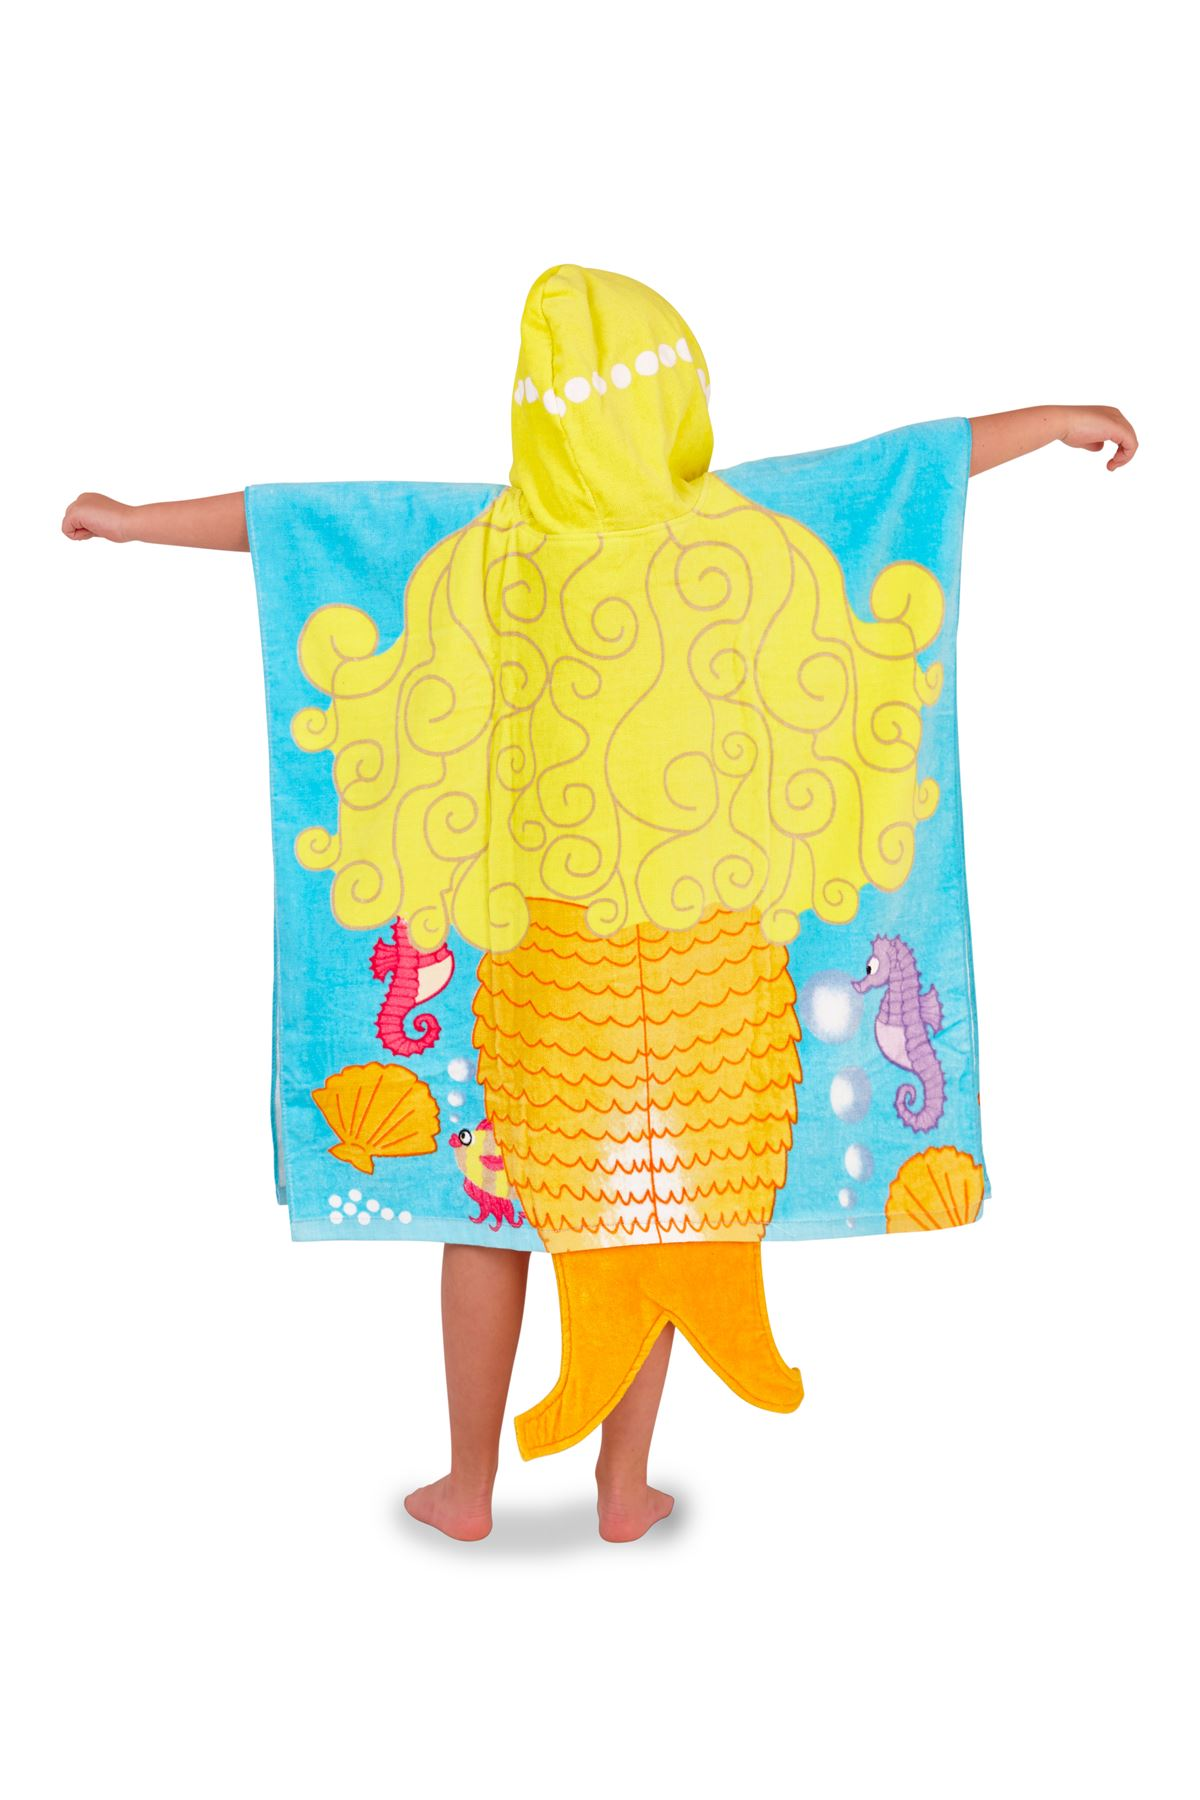 Childrens-Kids-Boys-Girls-Novelty-Hooded-Poncho-Swimming-Swim-Bath-Beach-Towel thumbnail 13